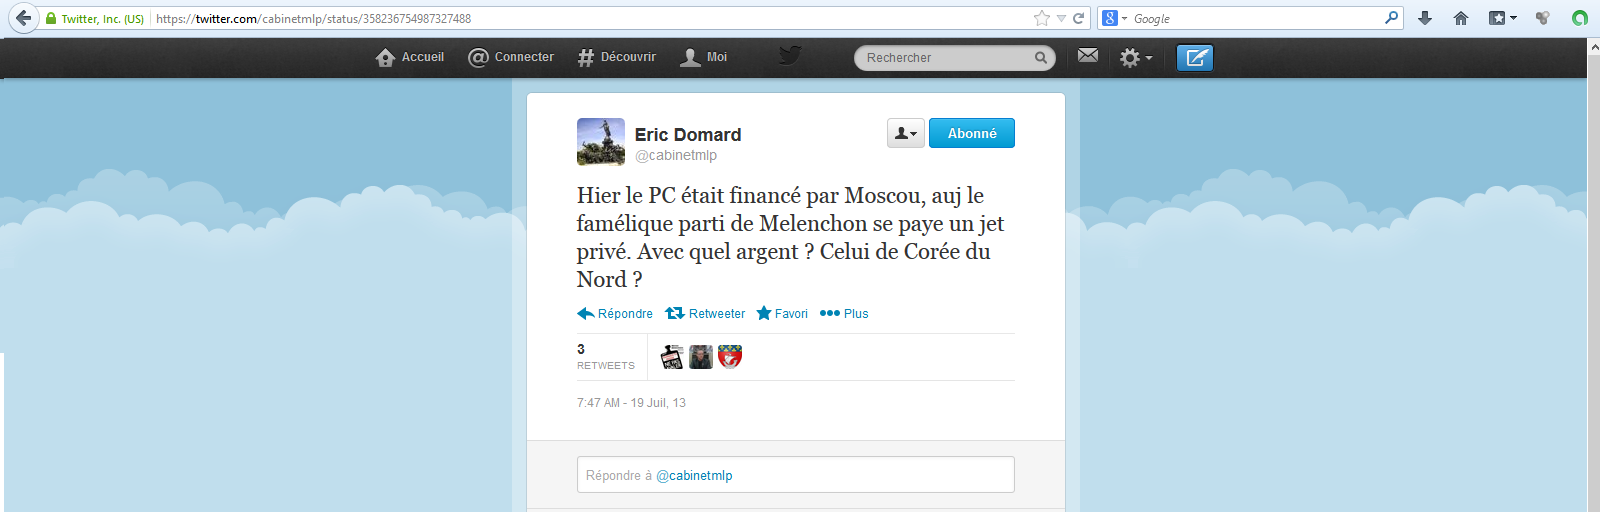 Eric-Domard-19-06-13-Melenchon-et-Coree-du-Nord